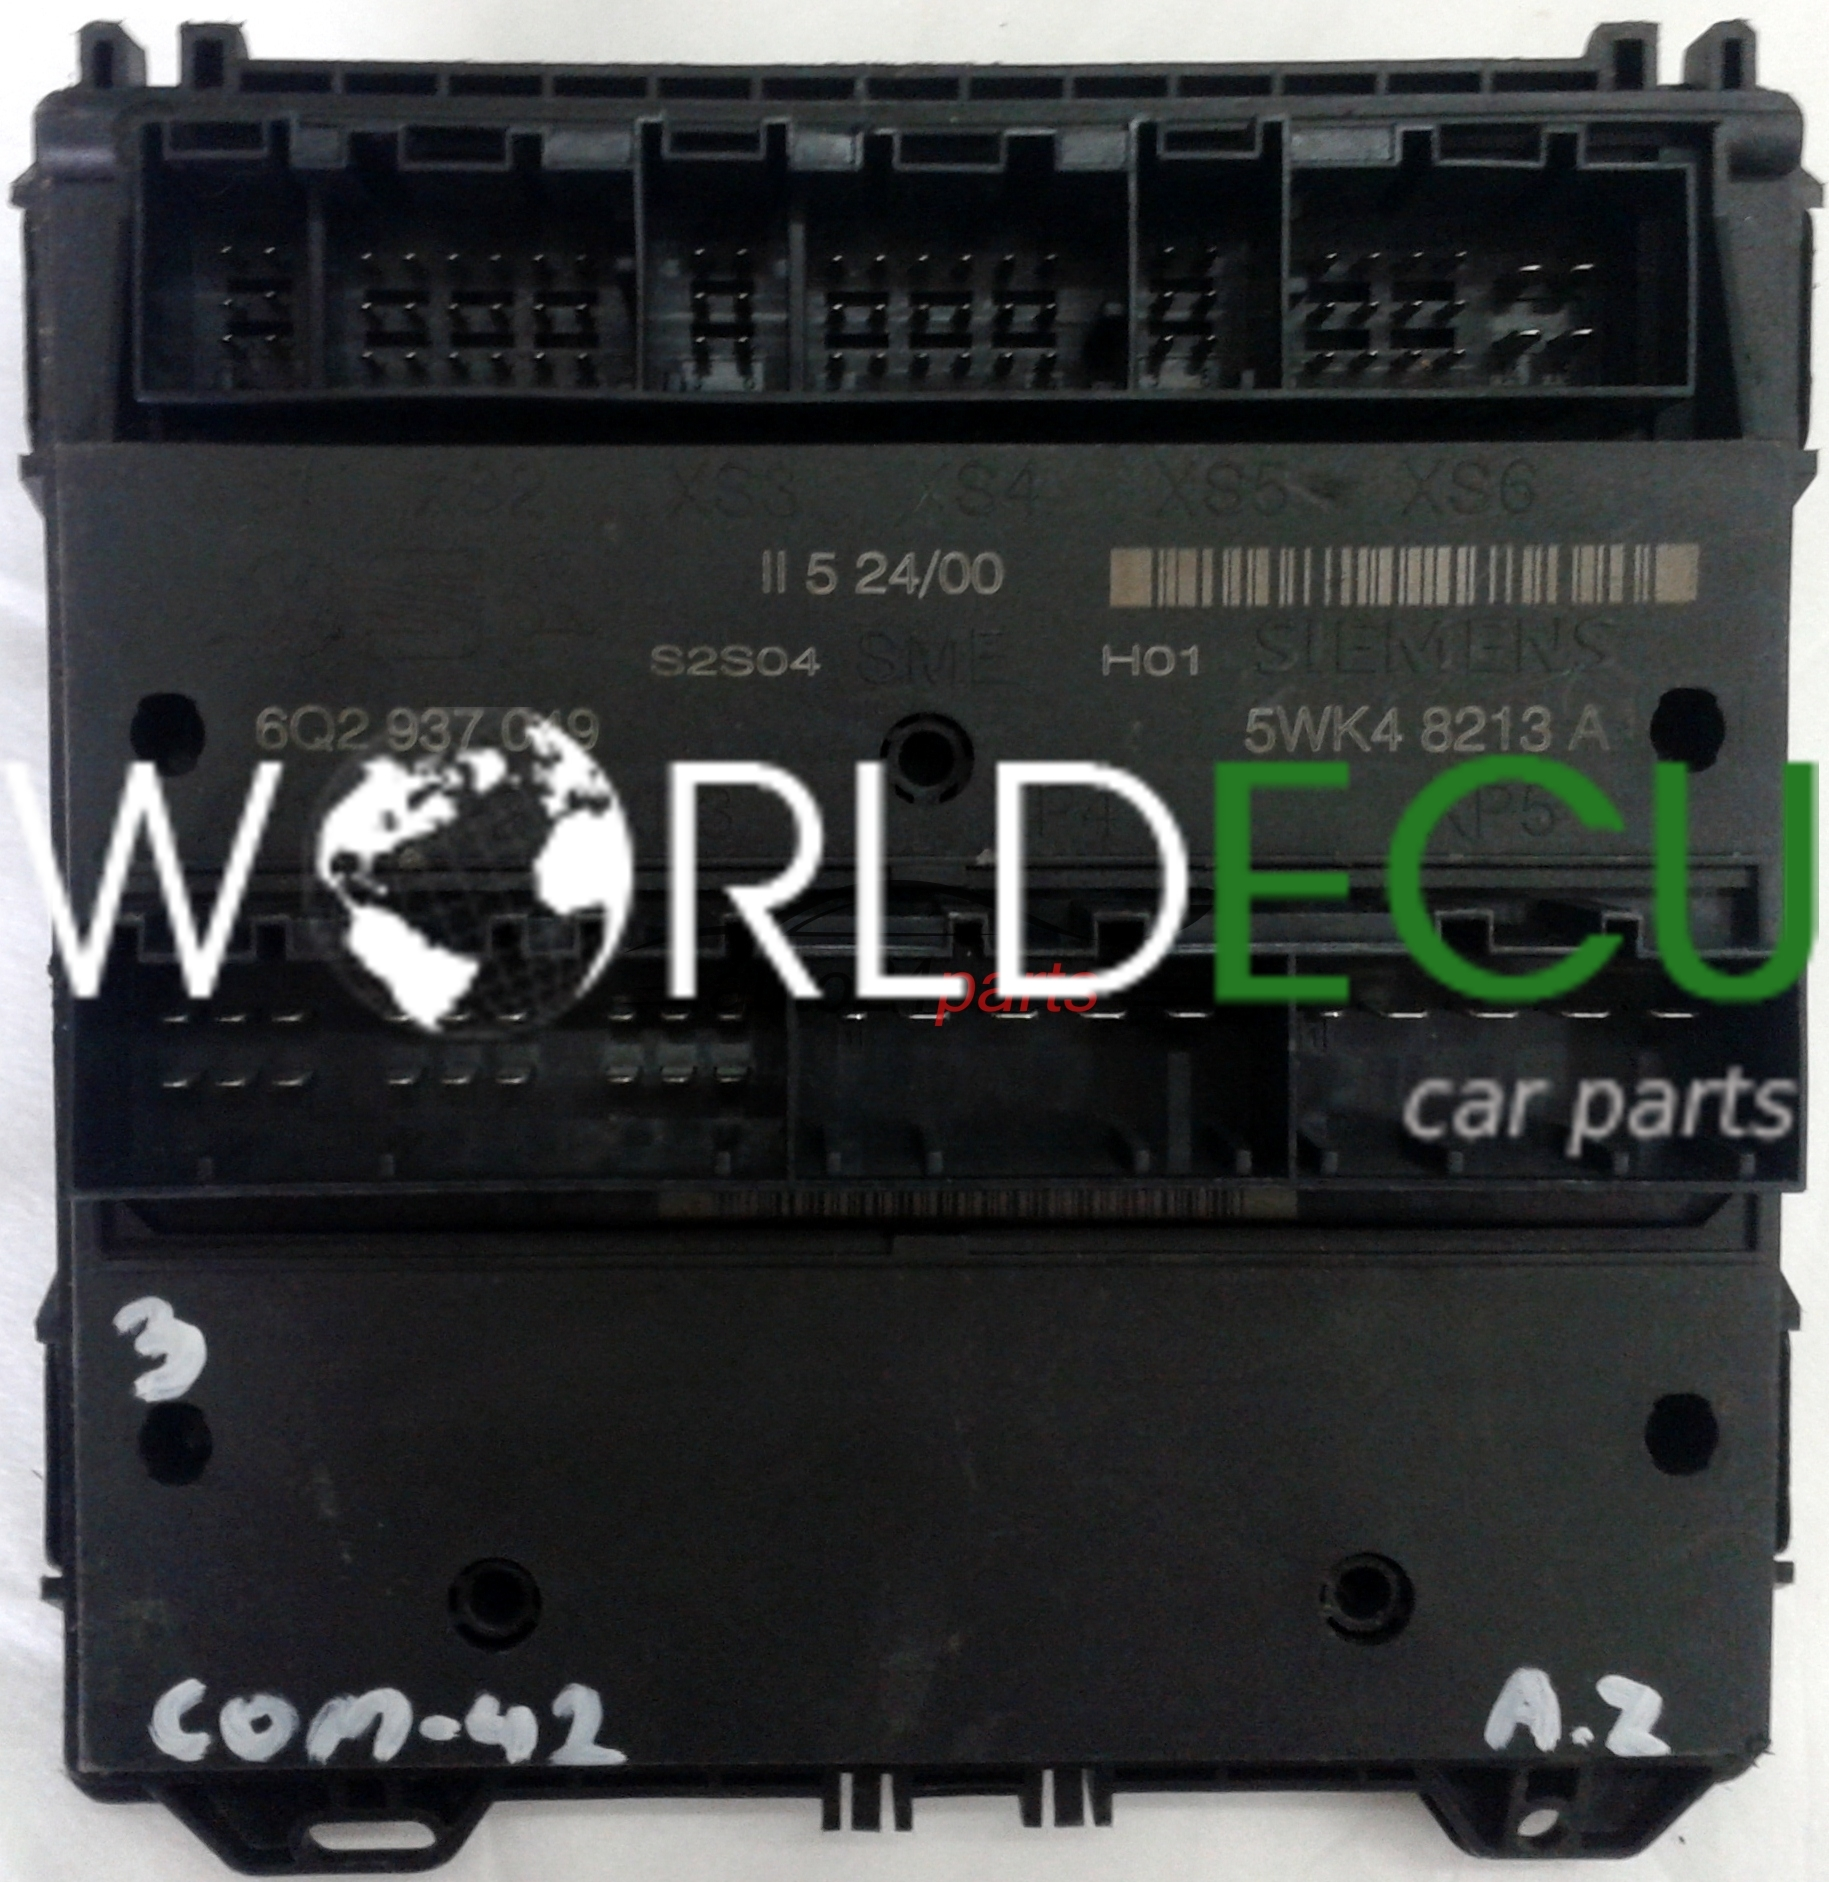 skoda fabia mk1 fuse box comfort control module 6q2937049 6q2 937 049 siemens